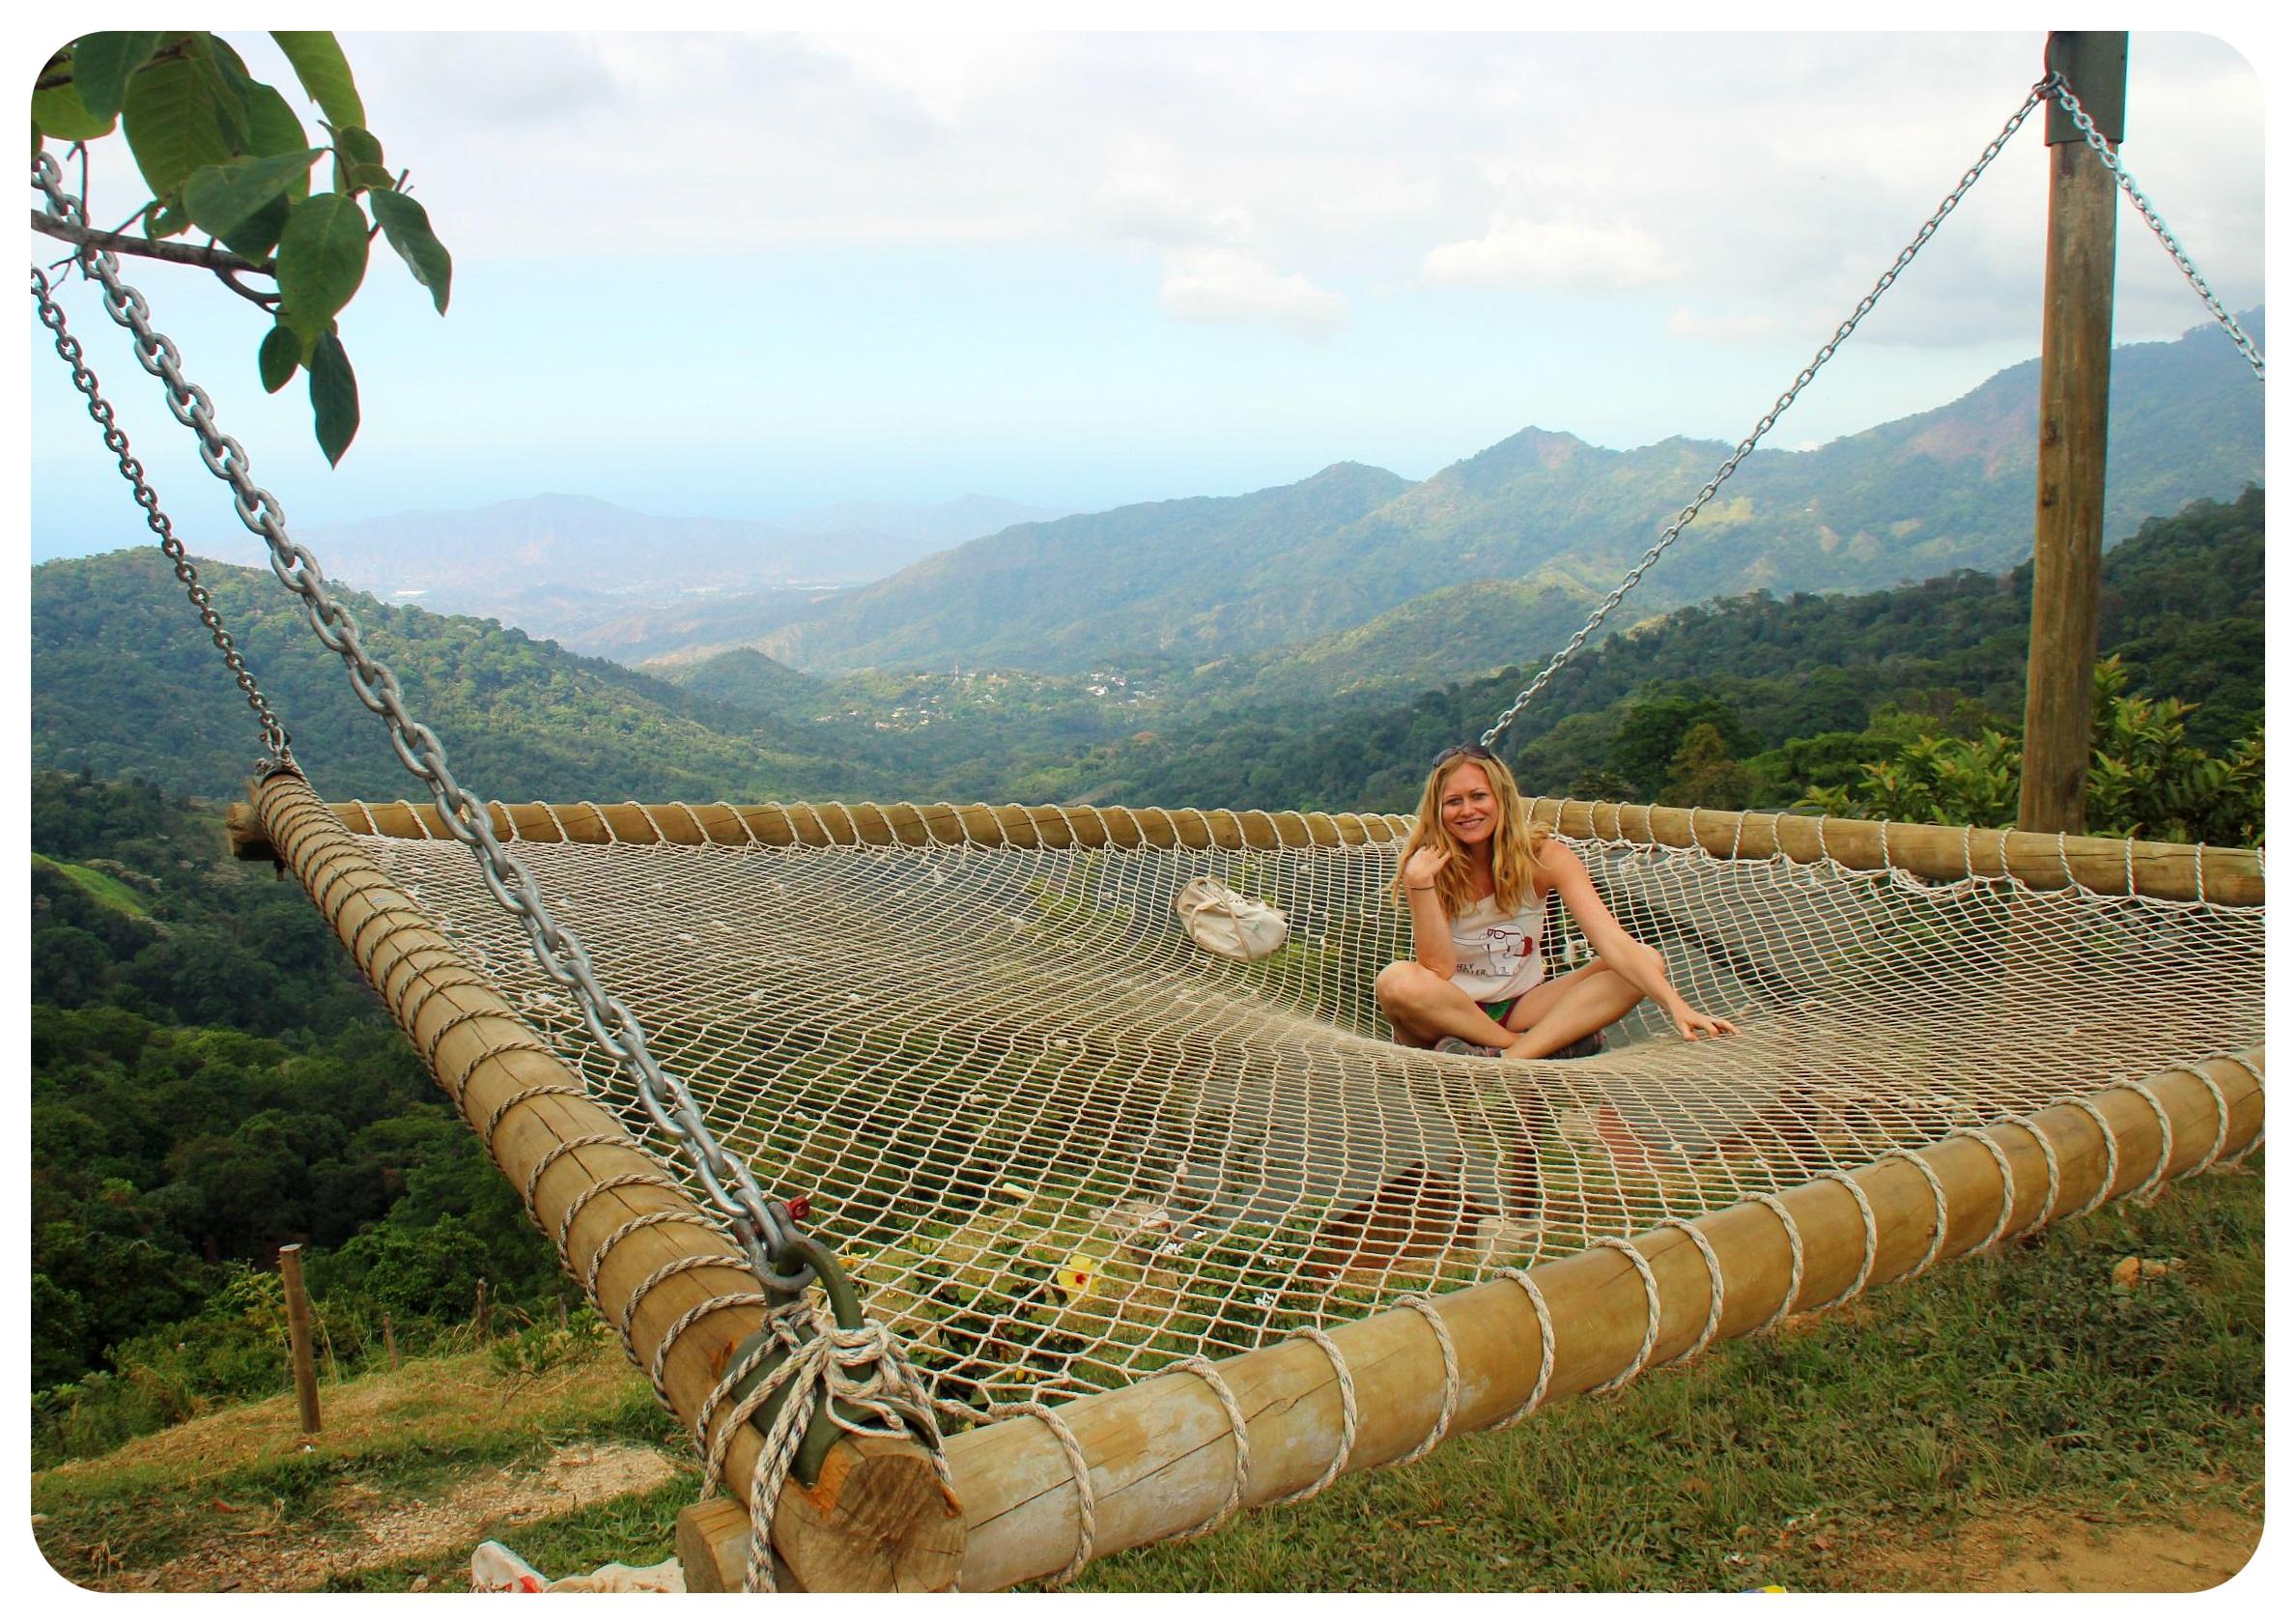 dani giant hammock minca